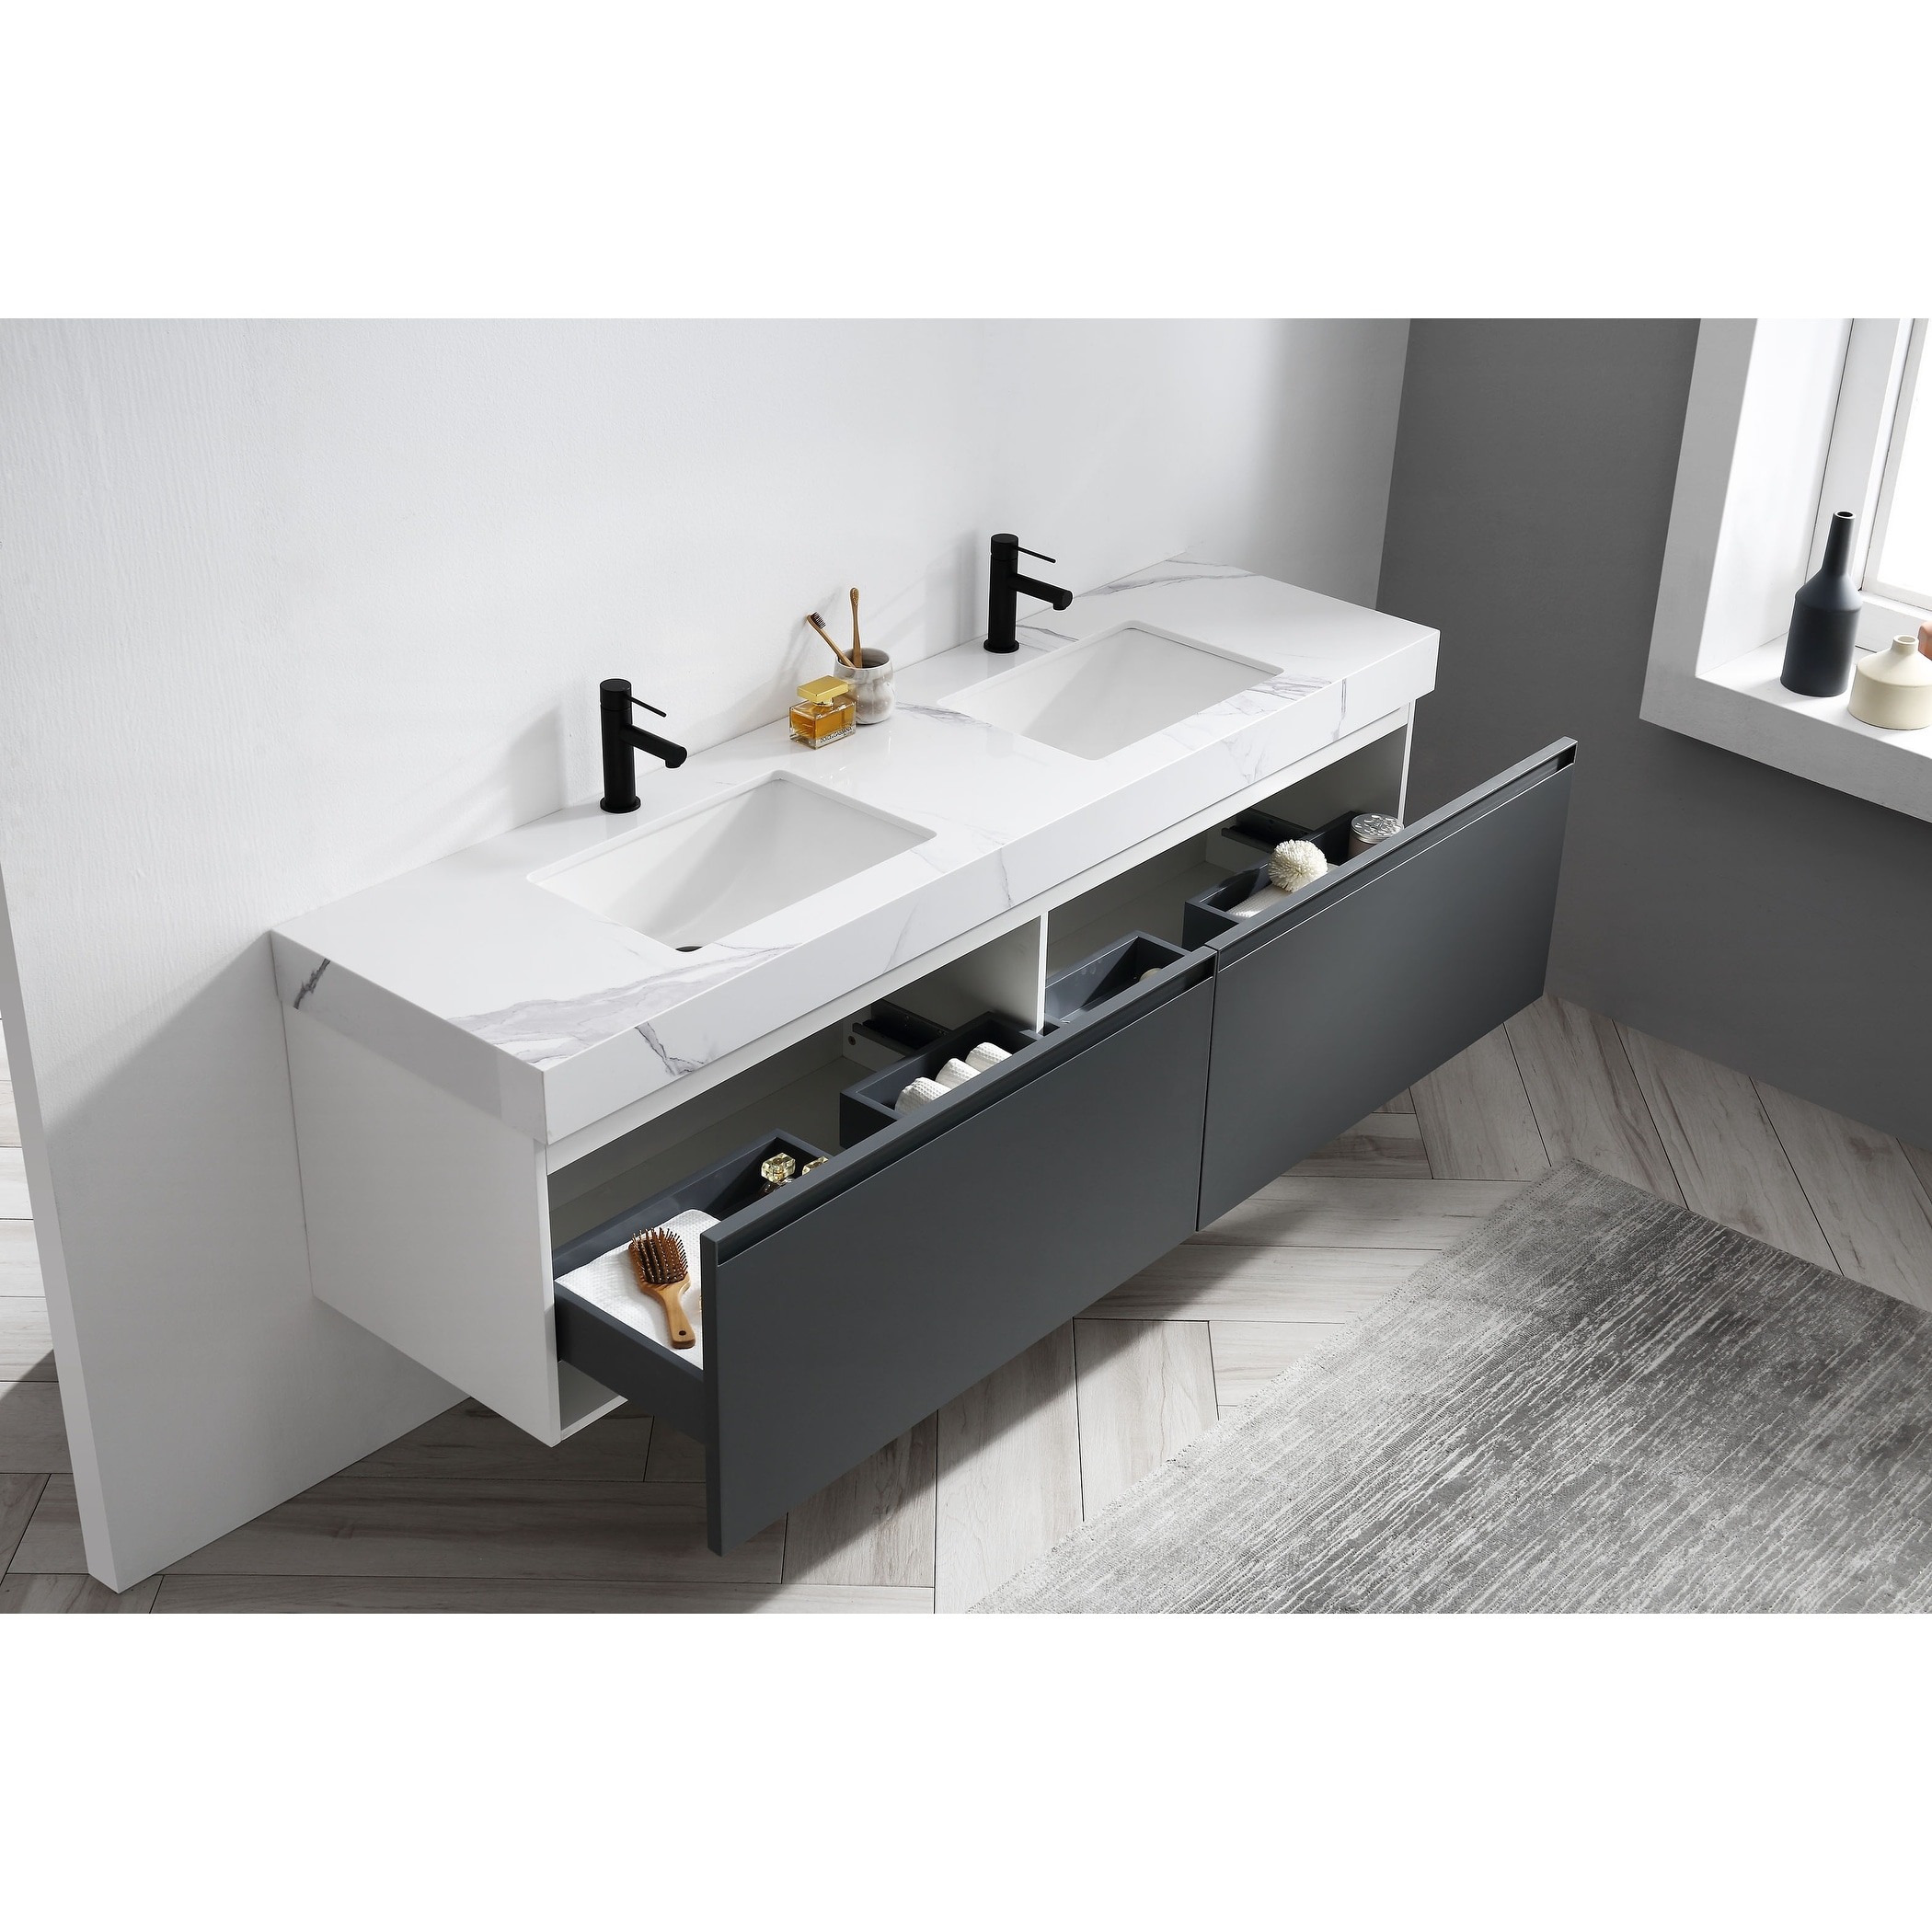 Maos 72 Dark Gray Navy Blue Wall Mount Modern Bathroom Vanity Set On Sale Overstock 31276125